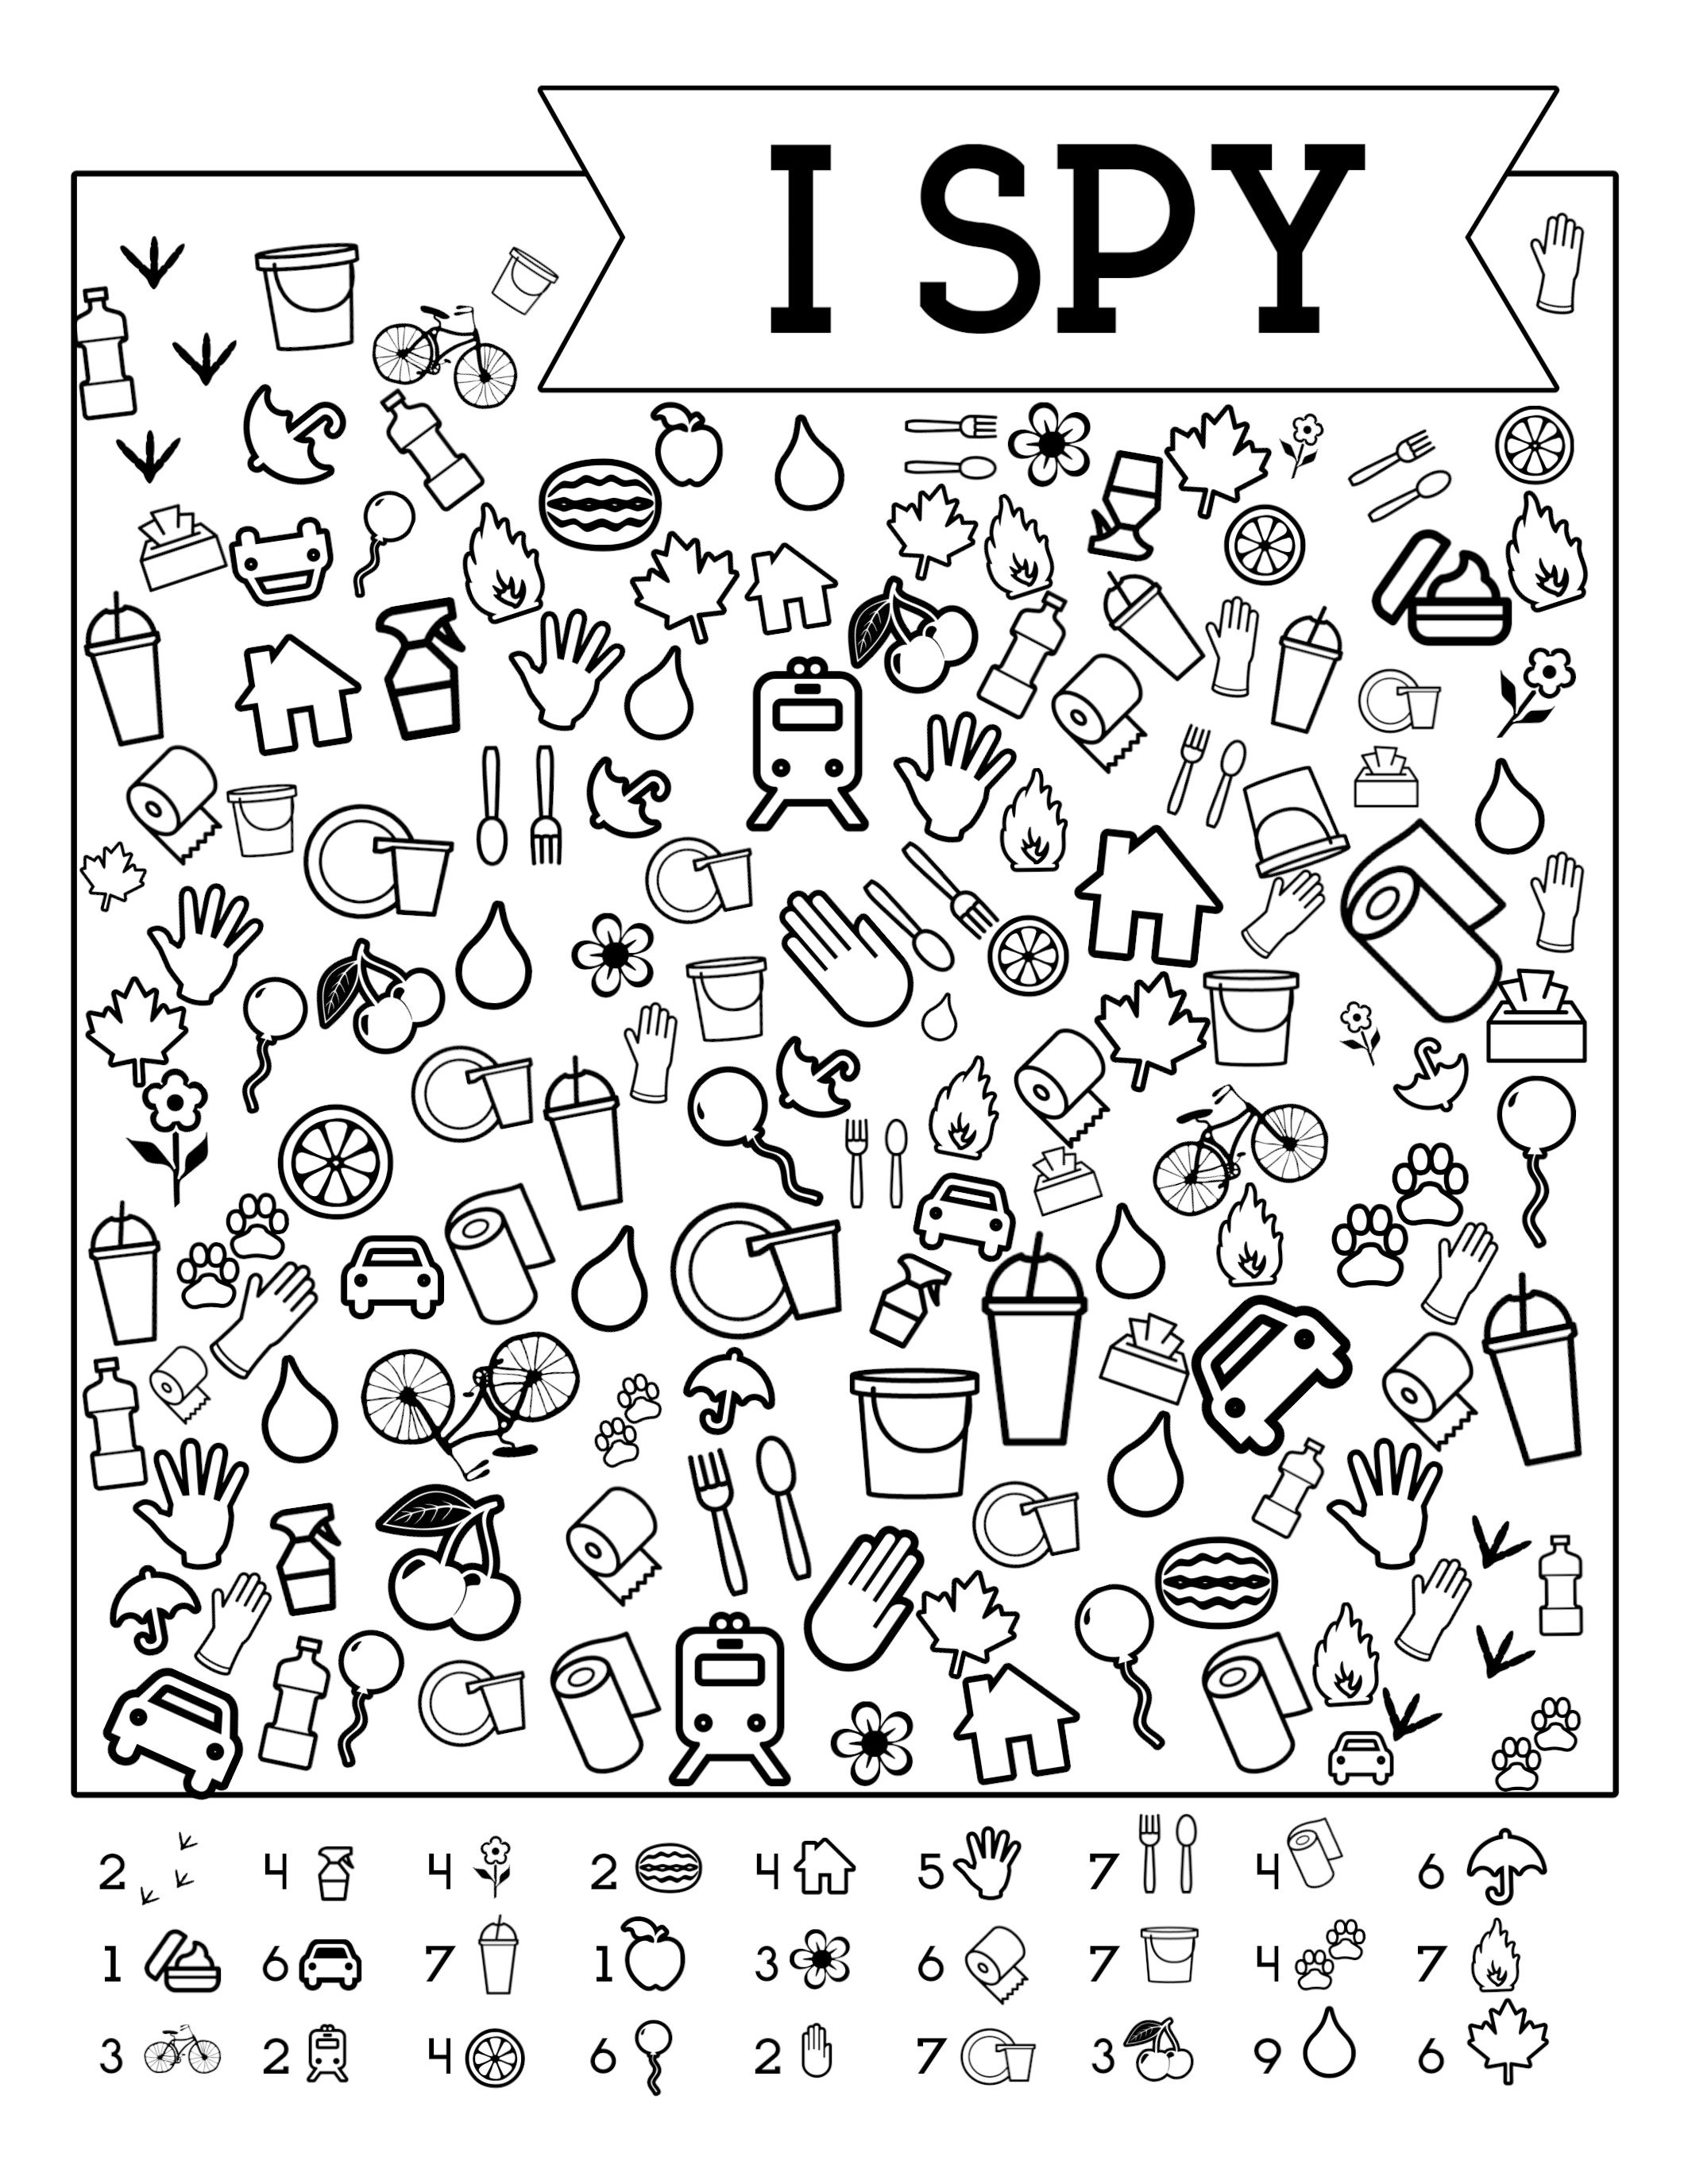 I-Spy-Free-Printable-Kids-Game | Spy School Camp | Spy Games For - Free Printable Hoy Sheets